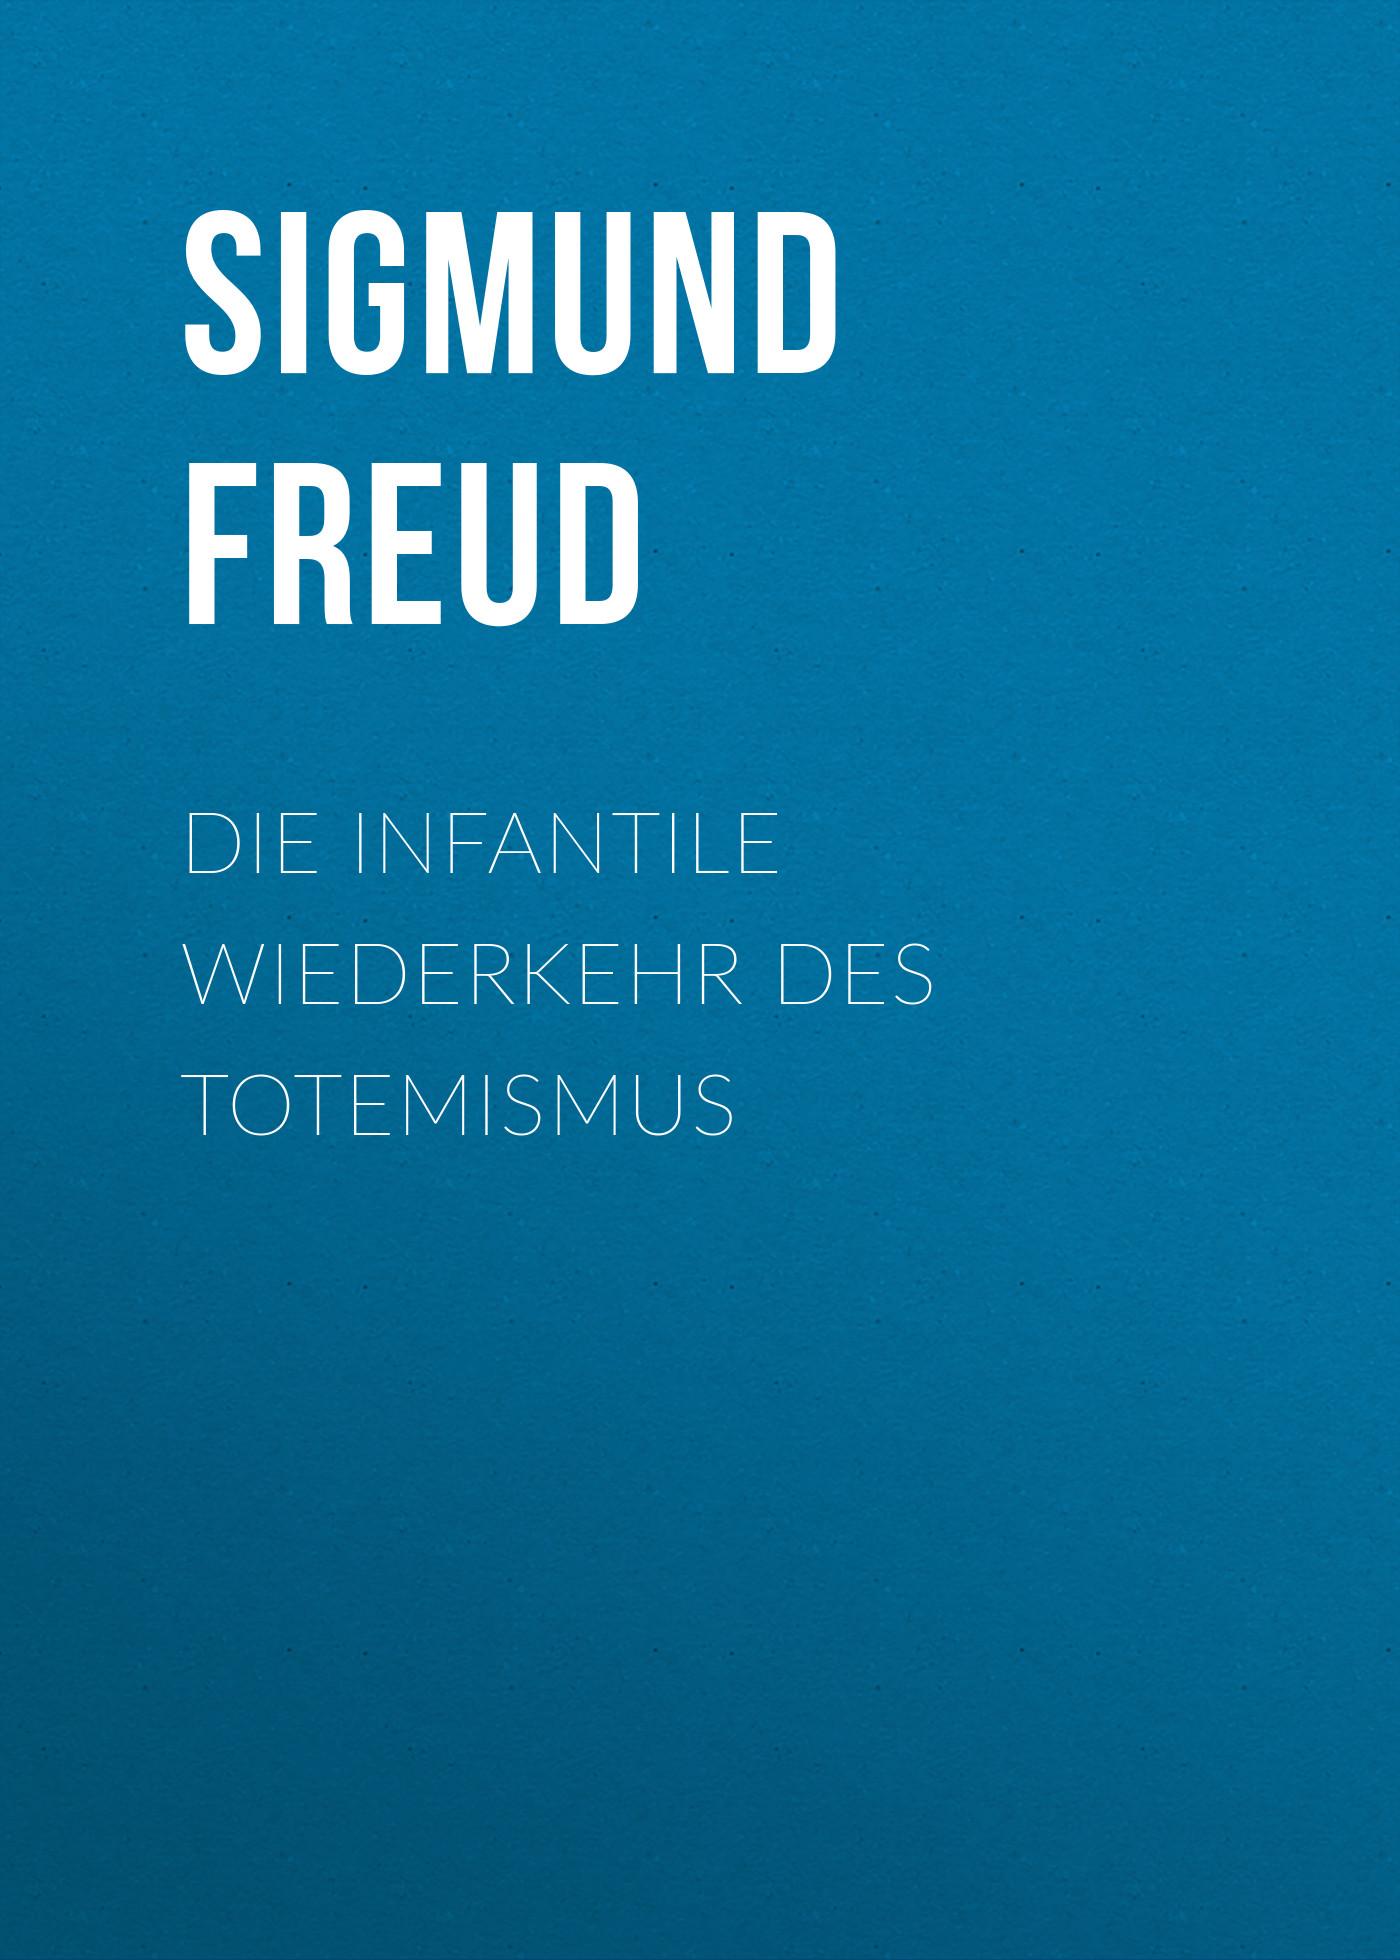 Зигмунд Фрейд Die infantile Wiederkehr des Totemismus michael bartsch wiederkehr page 7